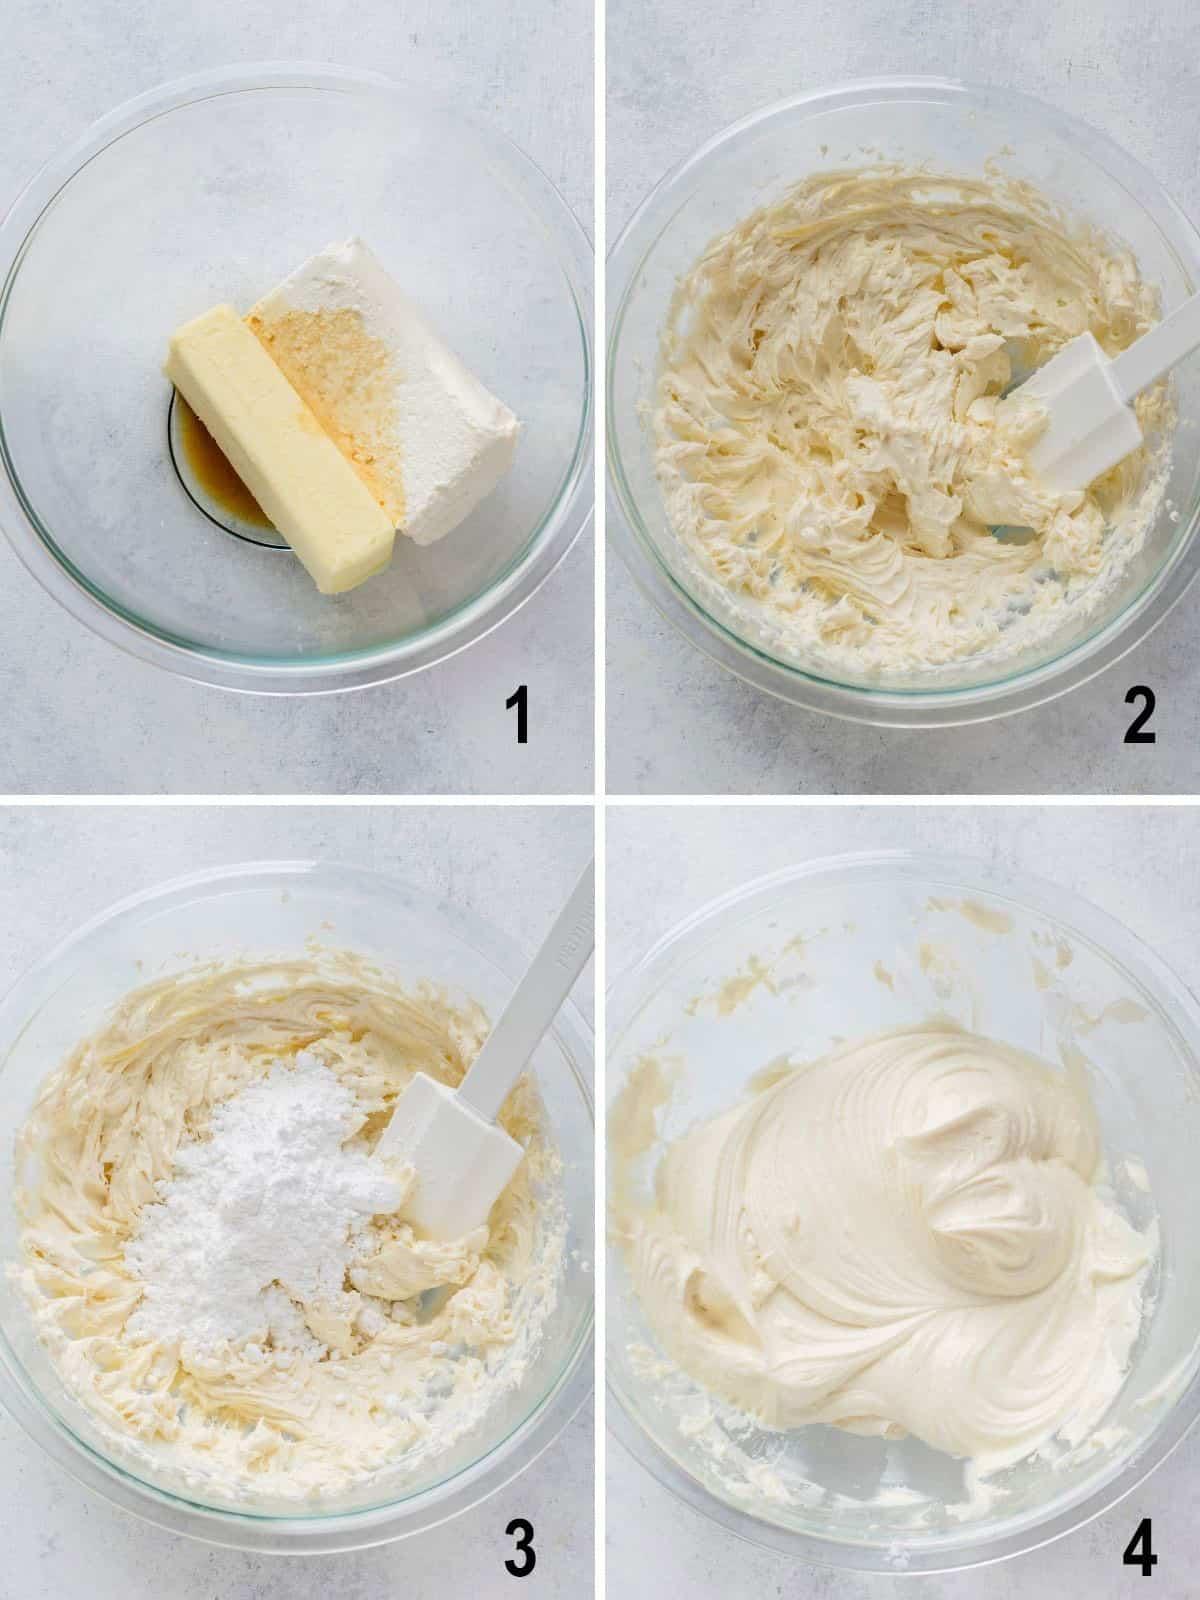 butter, cream cheese and vanilla, beaten mixture, sugar added, cream cheese frosting